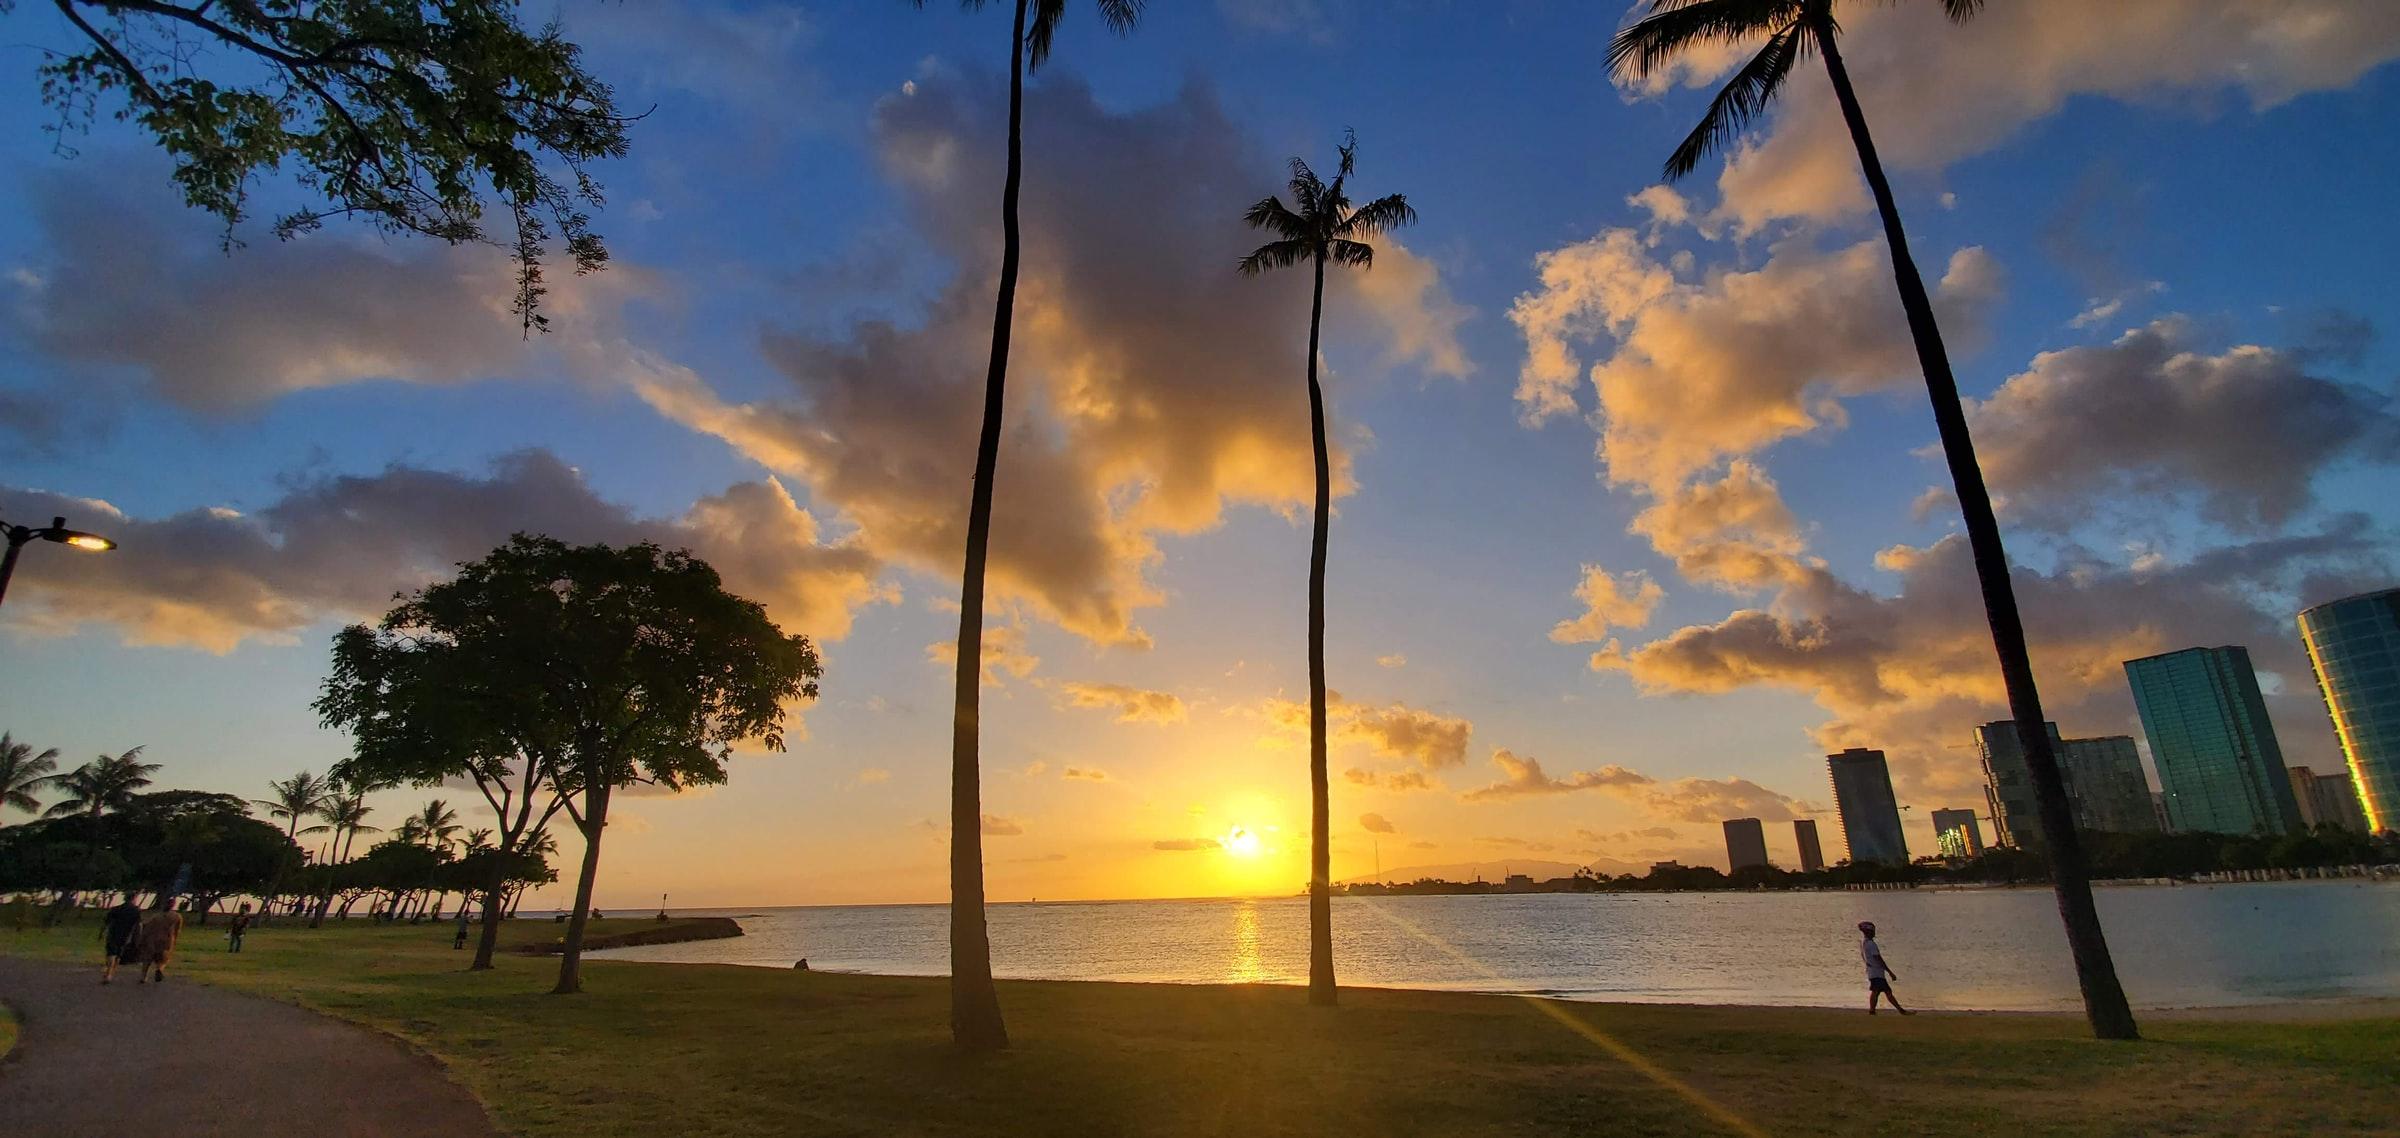 Waikiki Beach (photo by little plant from Unsplash)